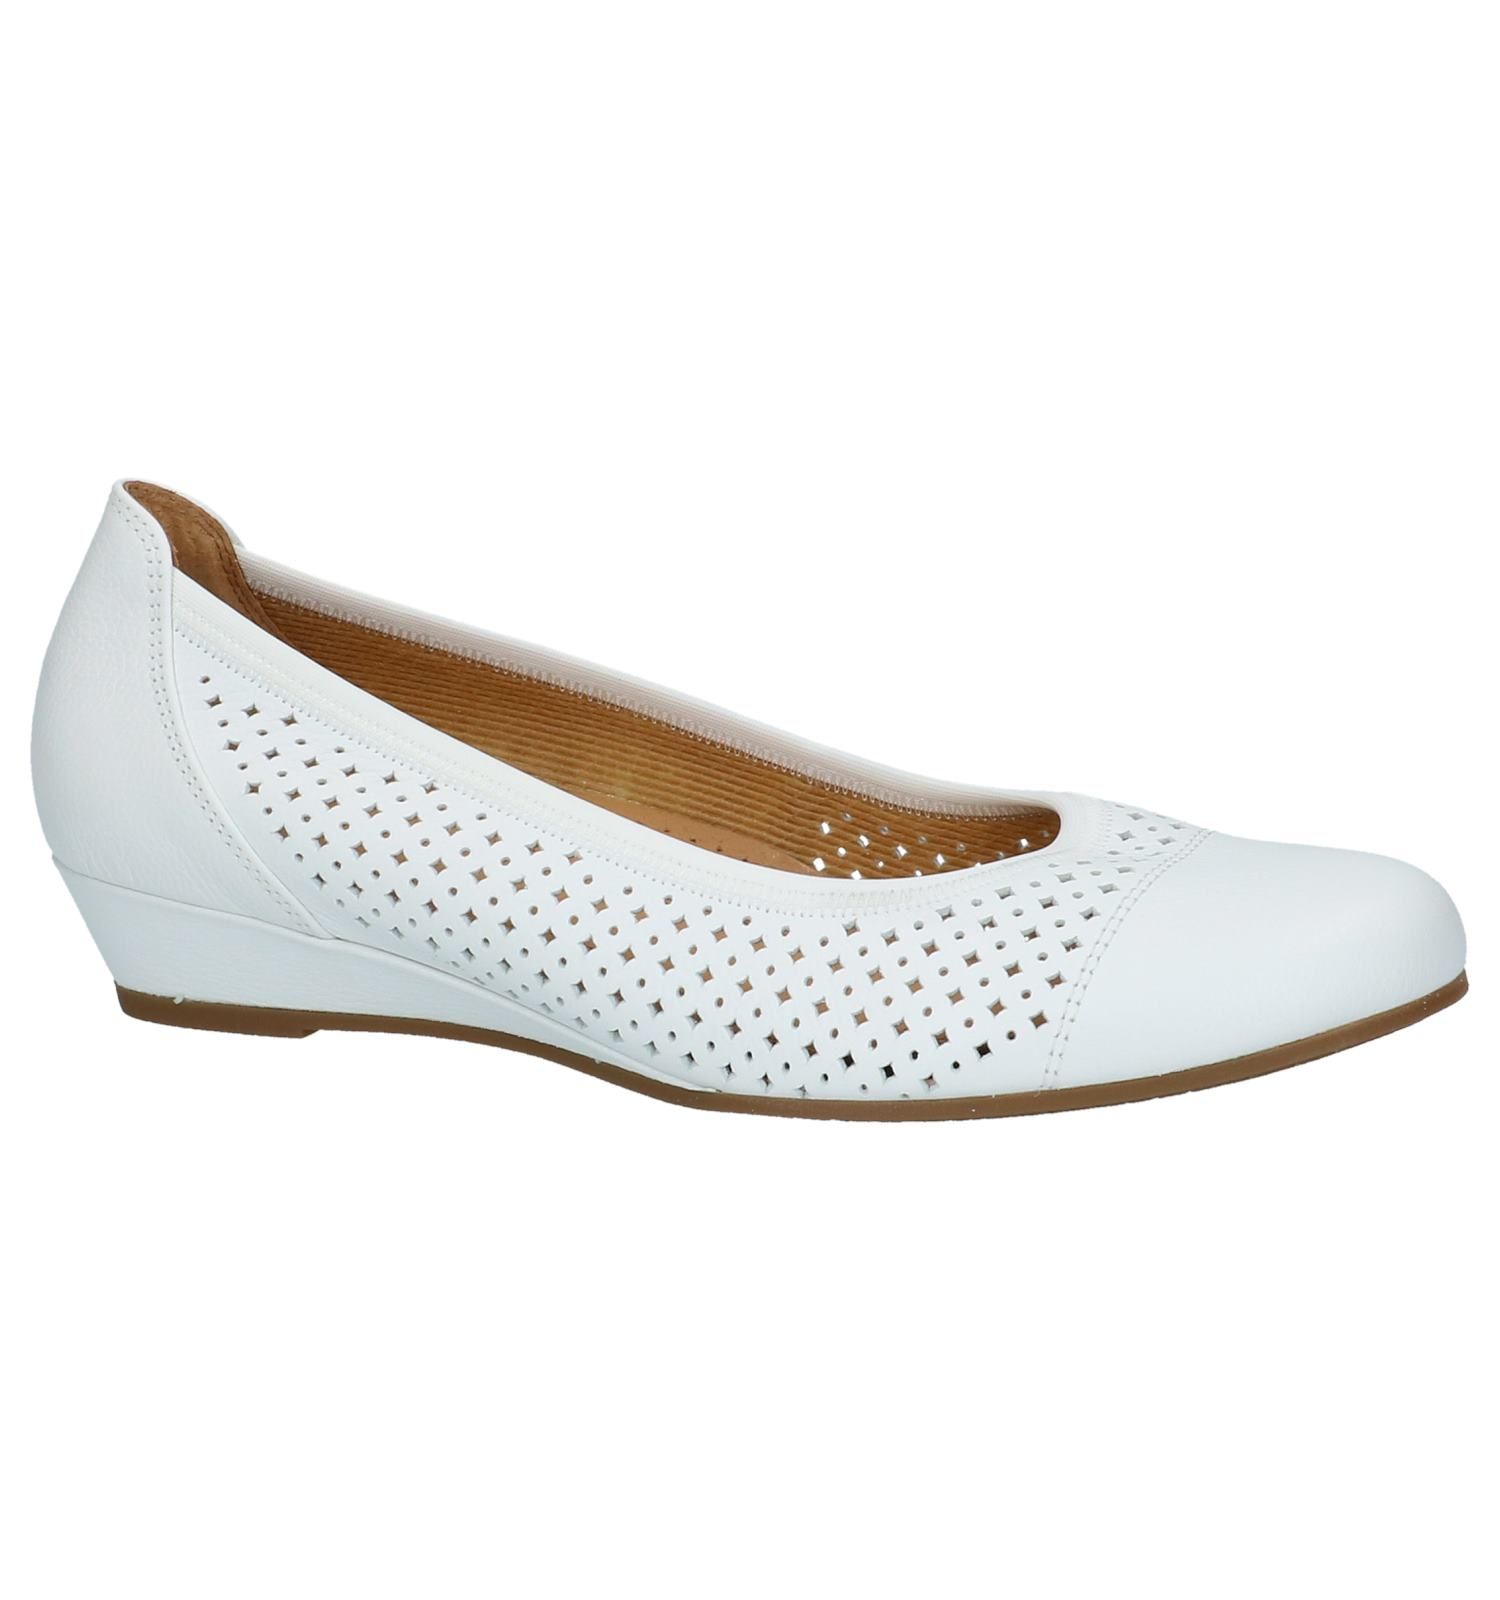 d1b626ca8fe Witte Ballerina's Gabor Easy Walking met Cut-Outs   TORFS.BE   Gratis  verzend en retour